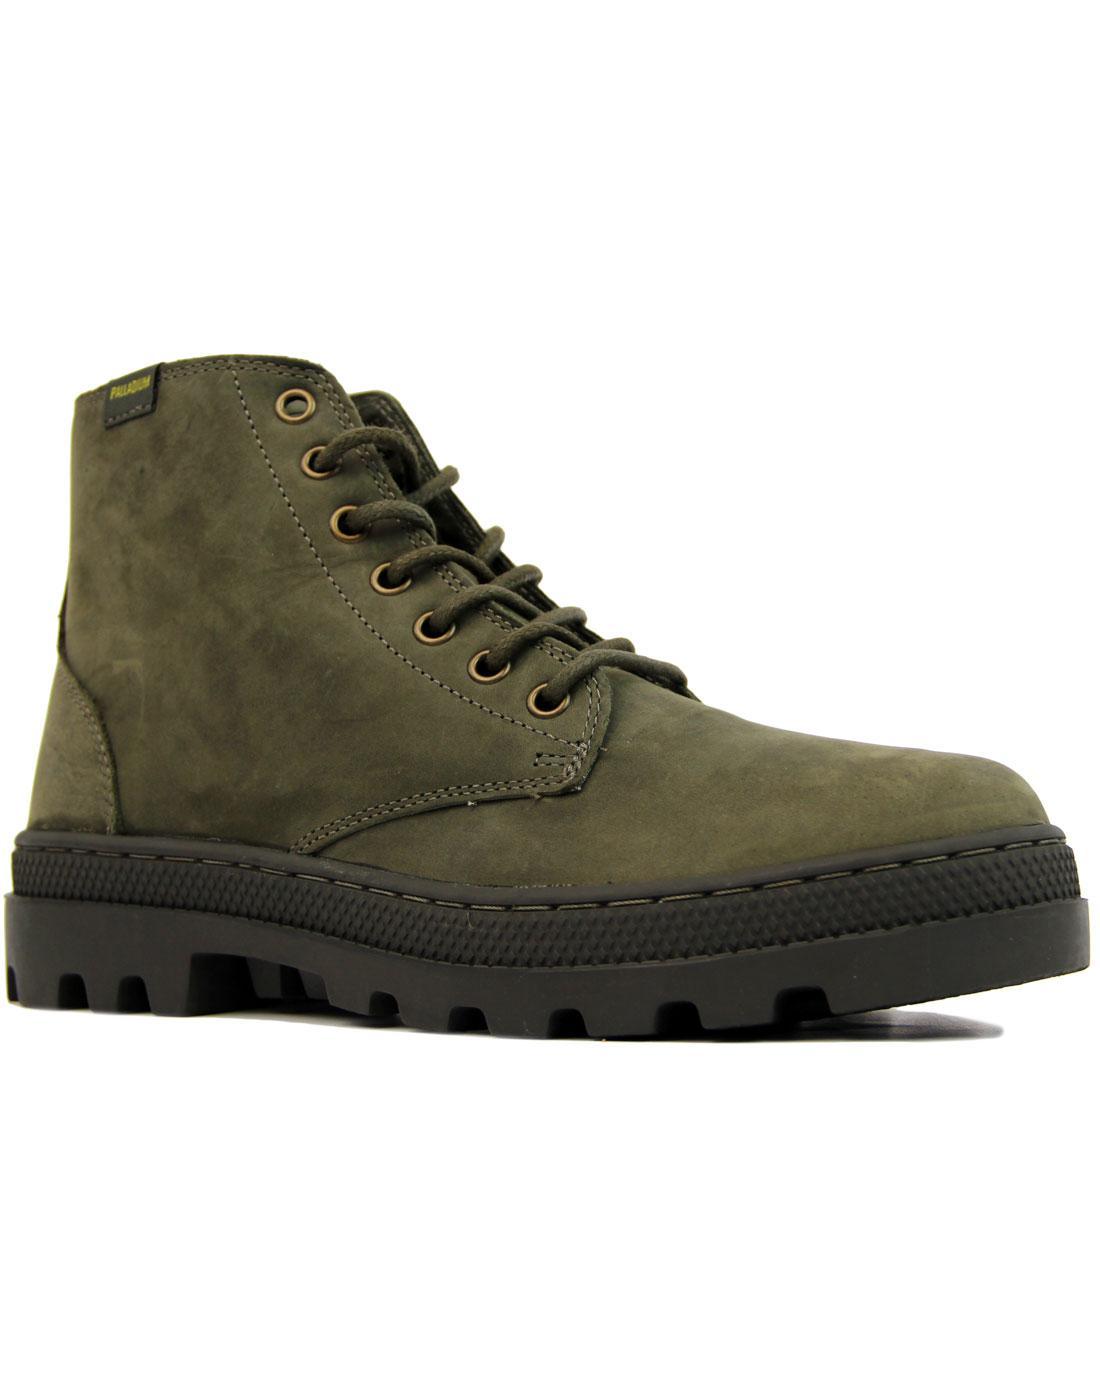 Pallabosse Mid PALLADIUM Retro Oiled Leather Boots